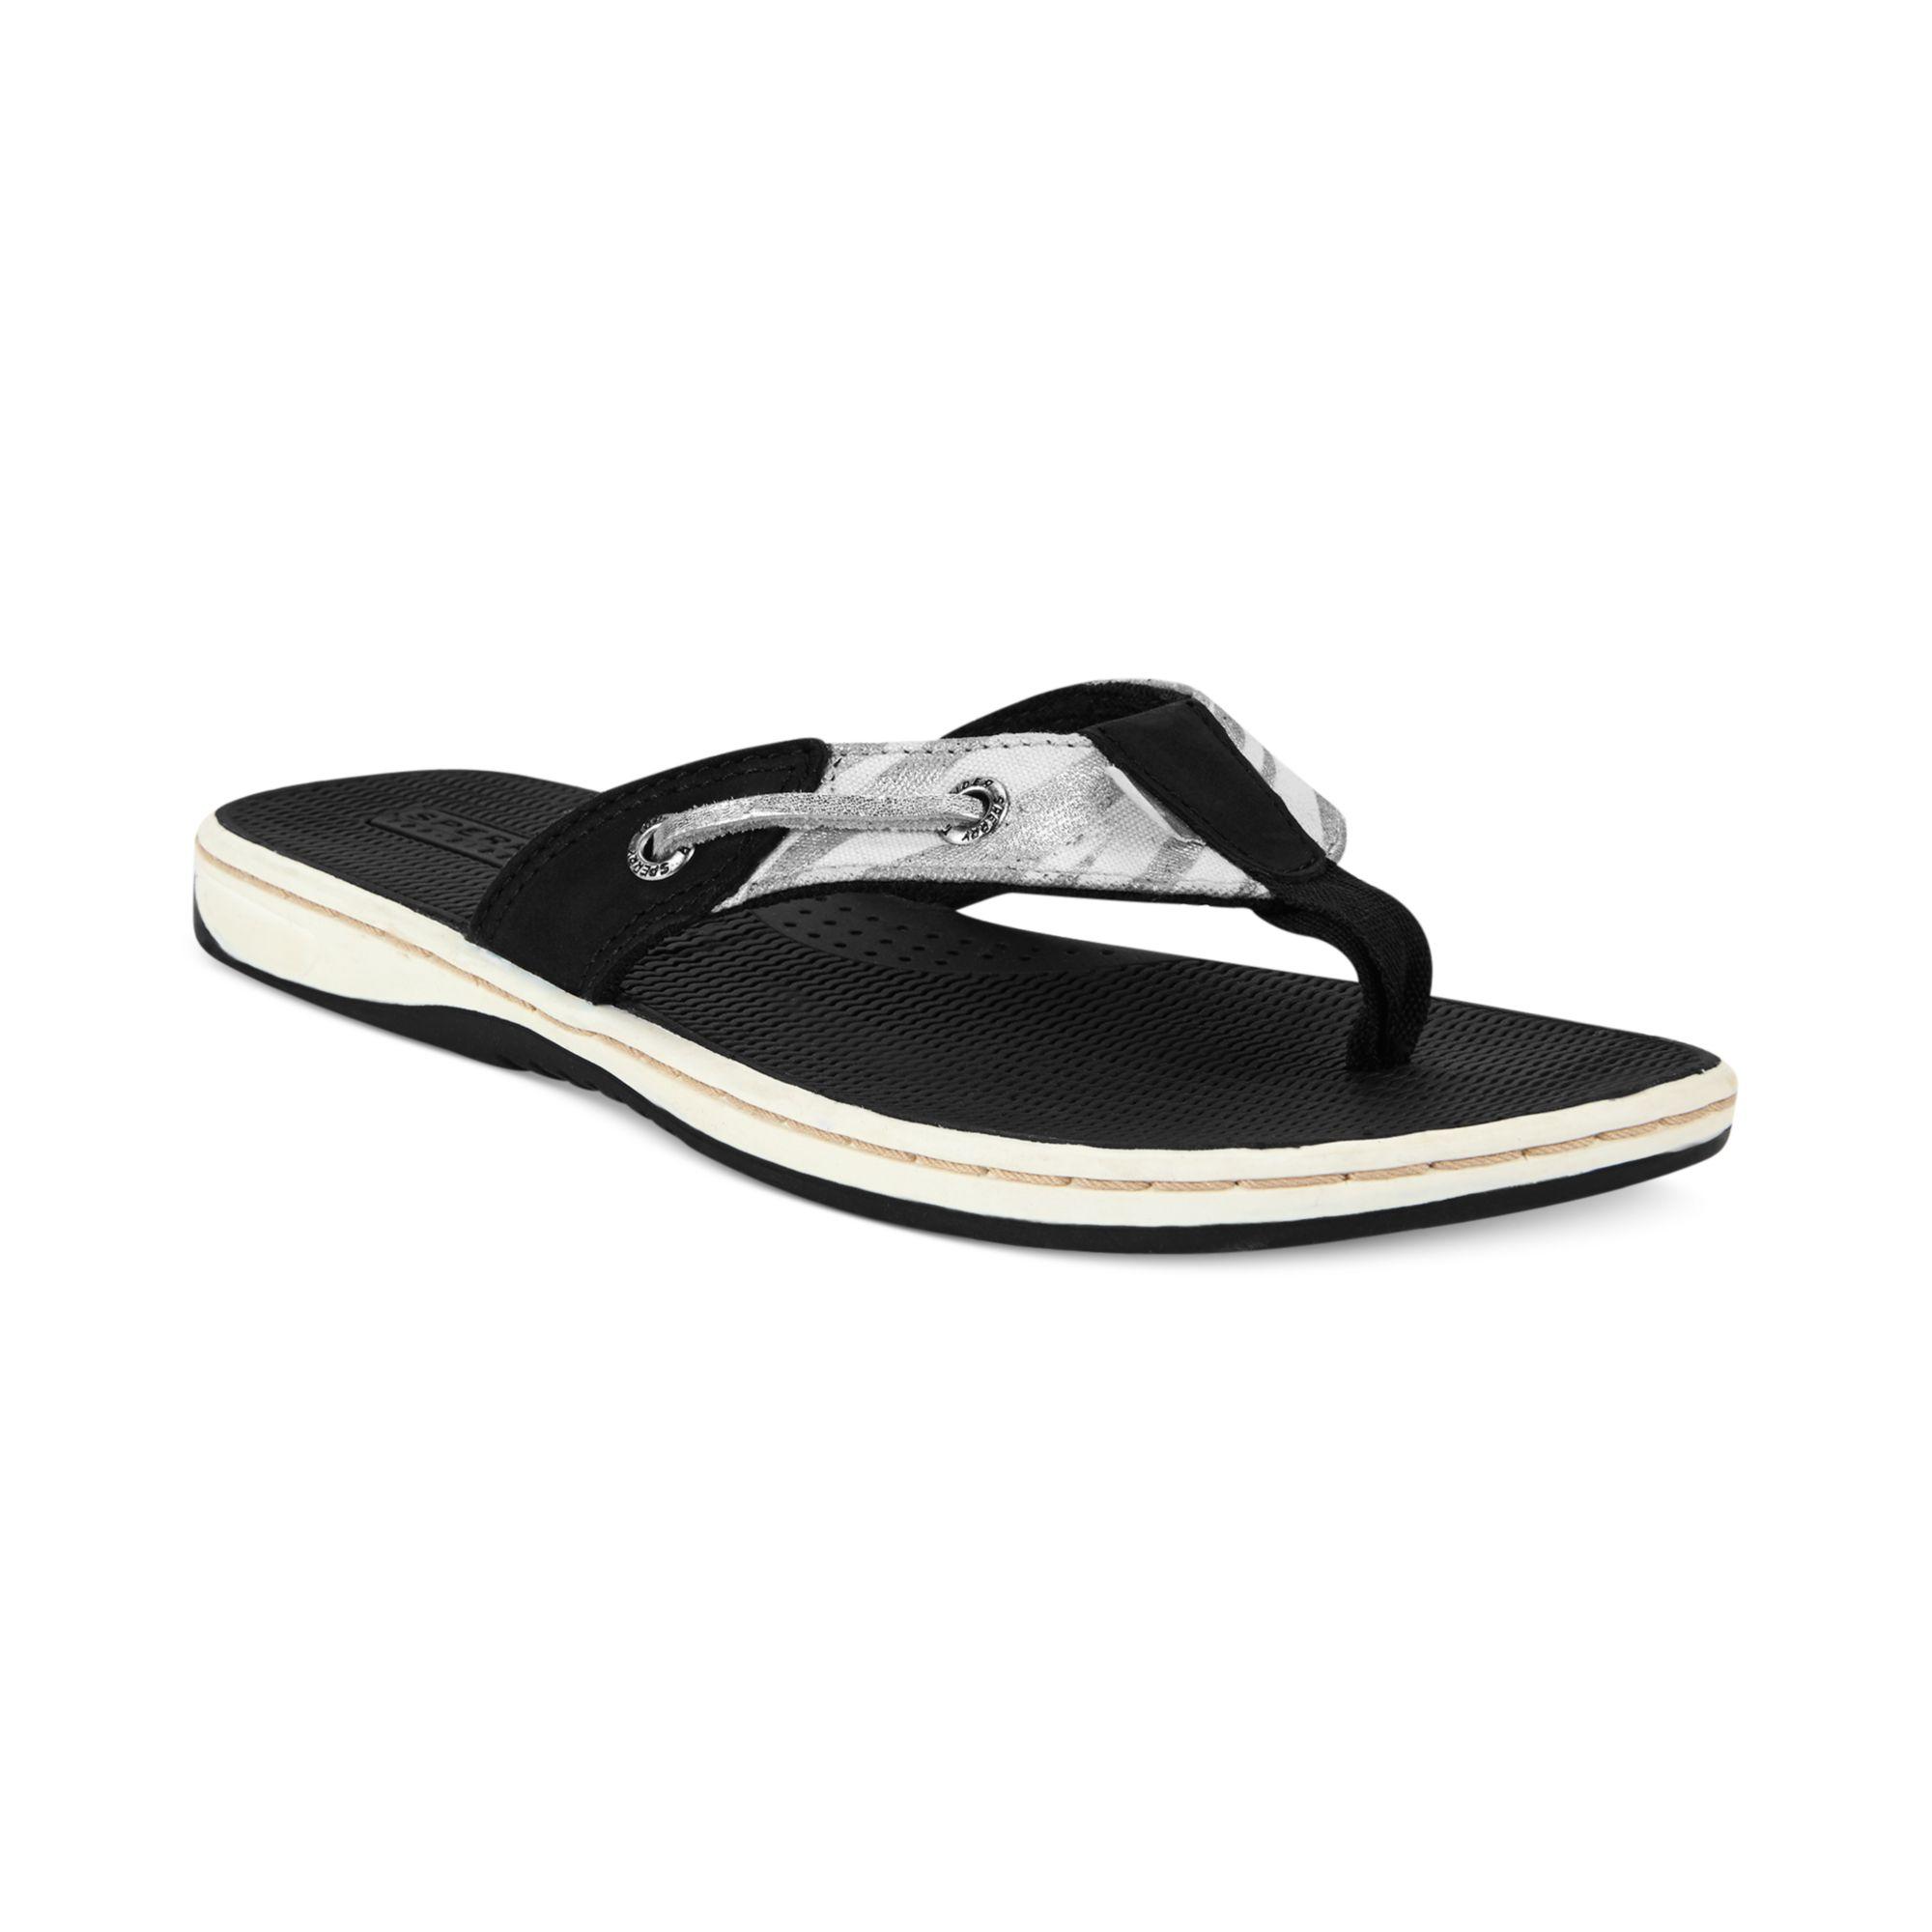 Sperry Top Sider Women S Seafish Shoe